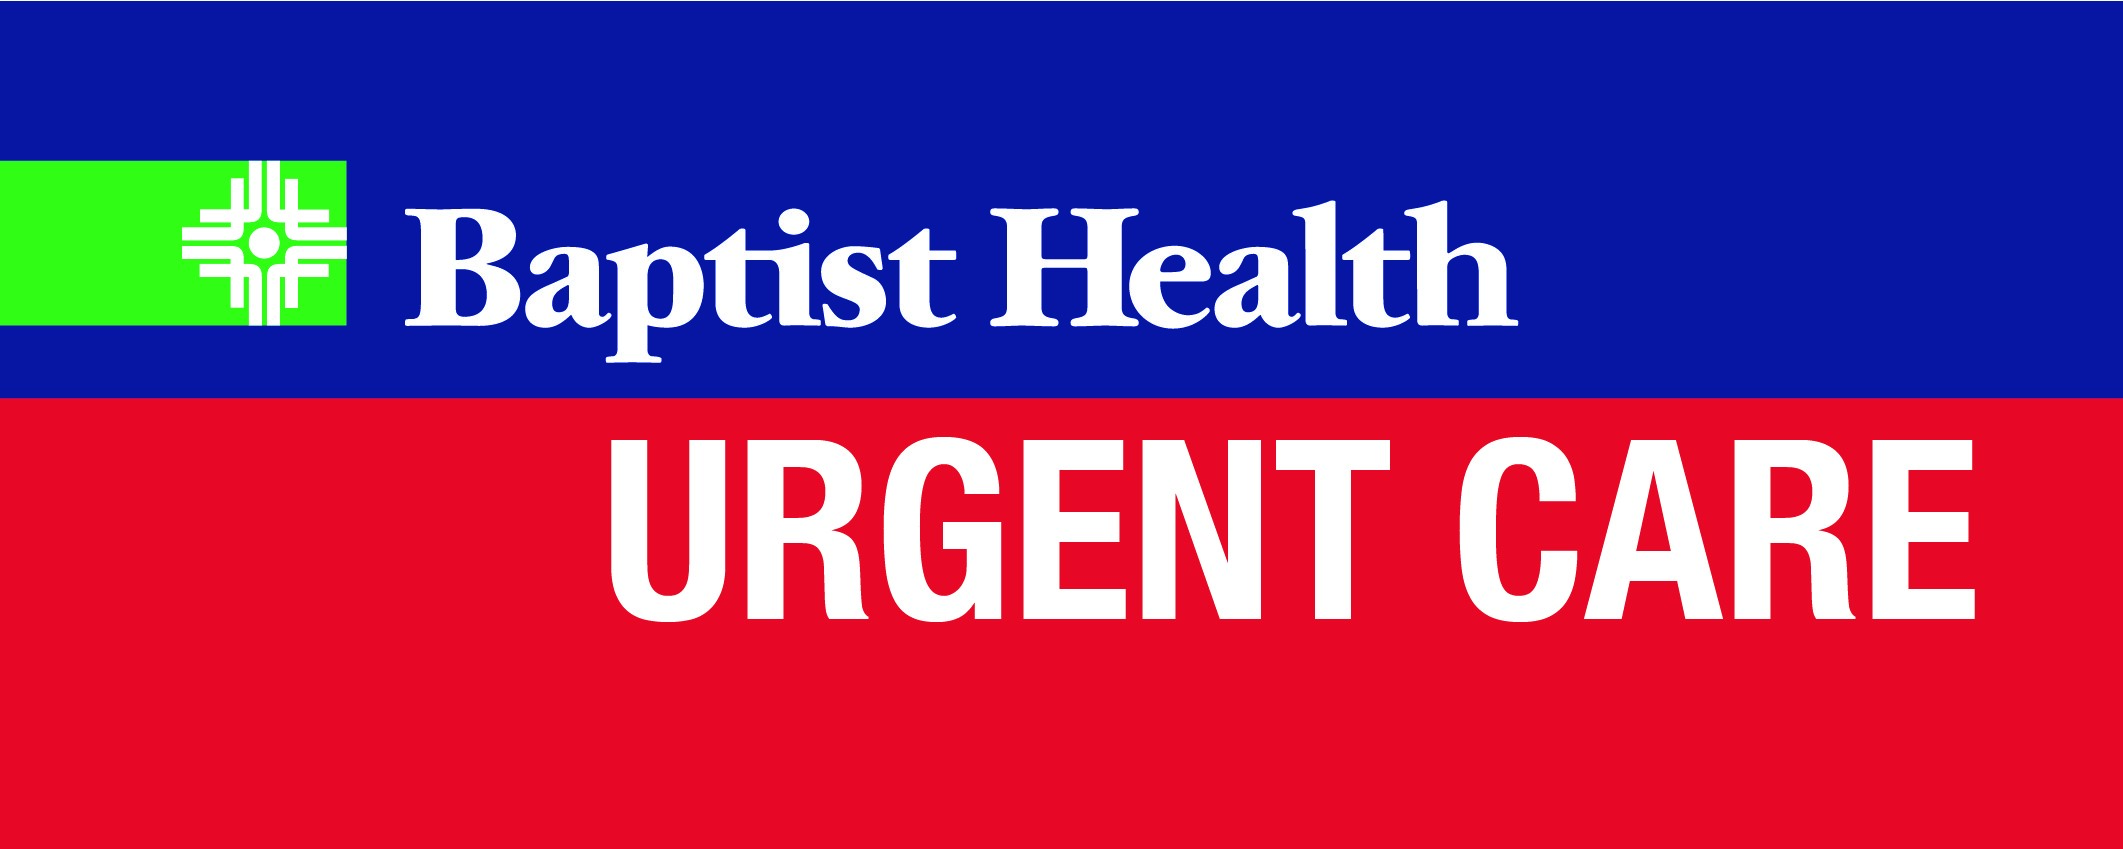 Baptist Health Urgent Care - Fort Smith (Zero St.) Logo